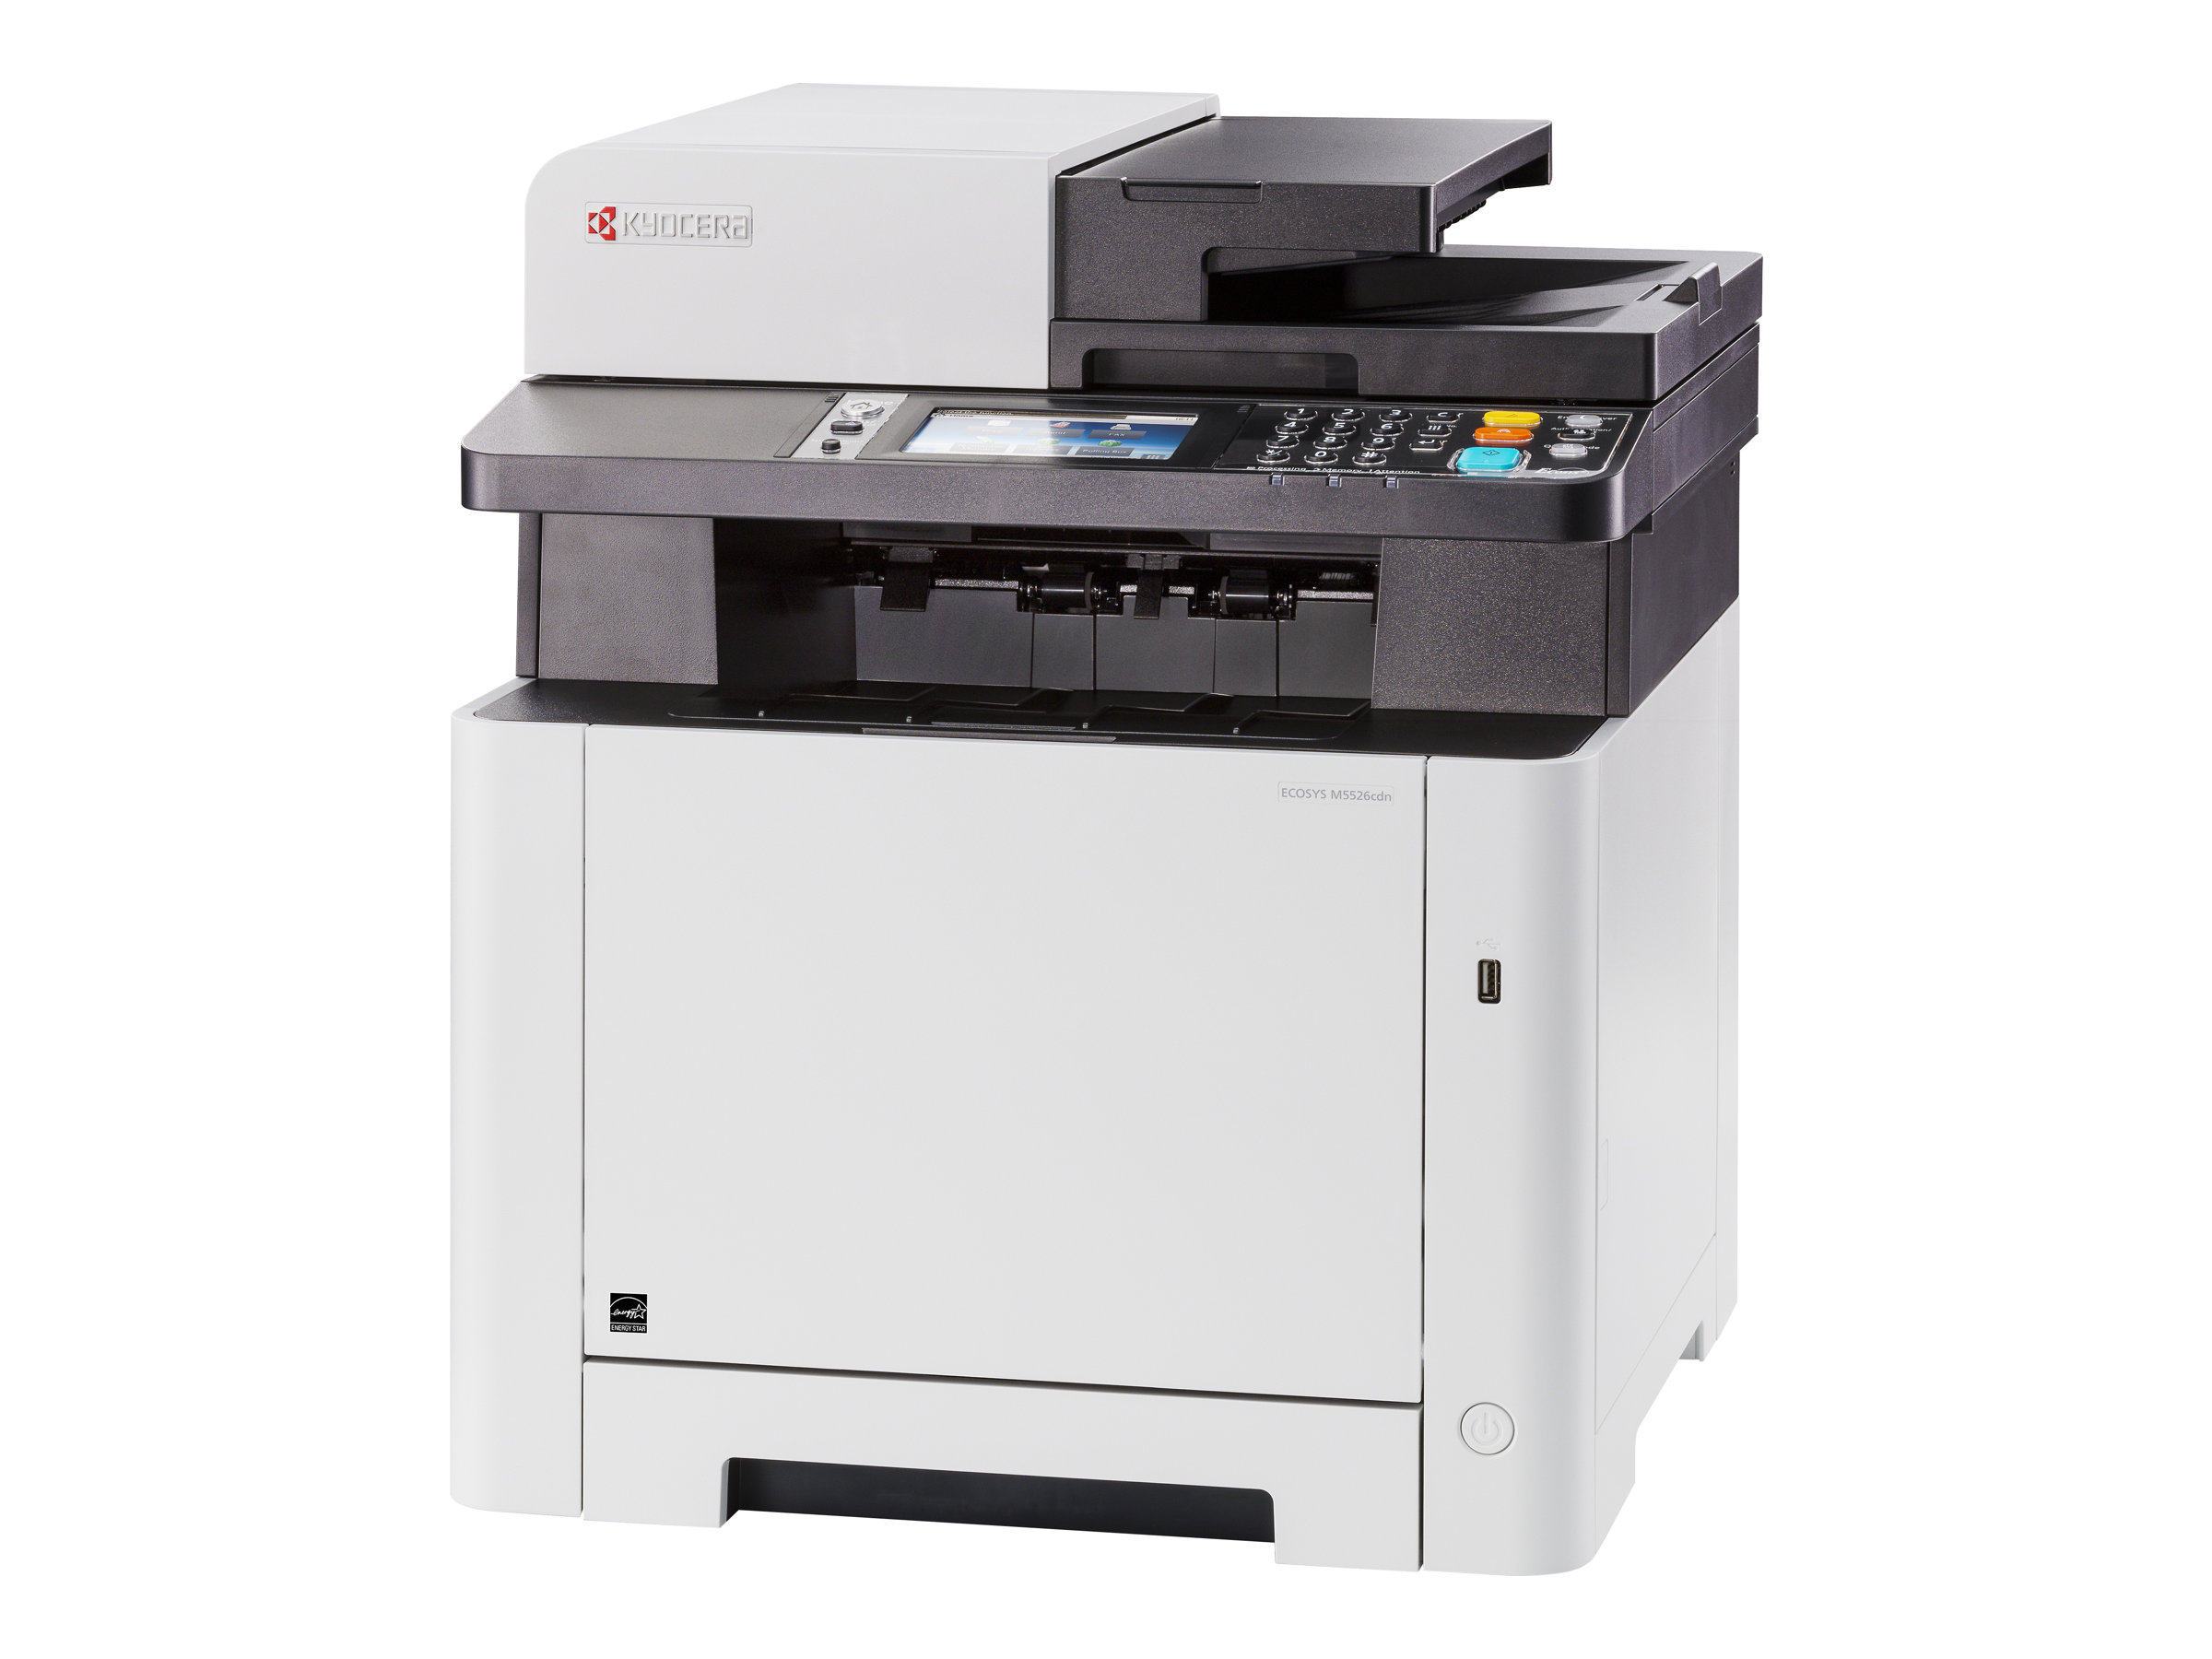 Kyocera ECOSYS M5526cdn - Multifunktionsdrucker - Farbe - Laser - Legal (216 x 356 mm)/A4 (210 x 297 mm) (Original) - A4/Legal (